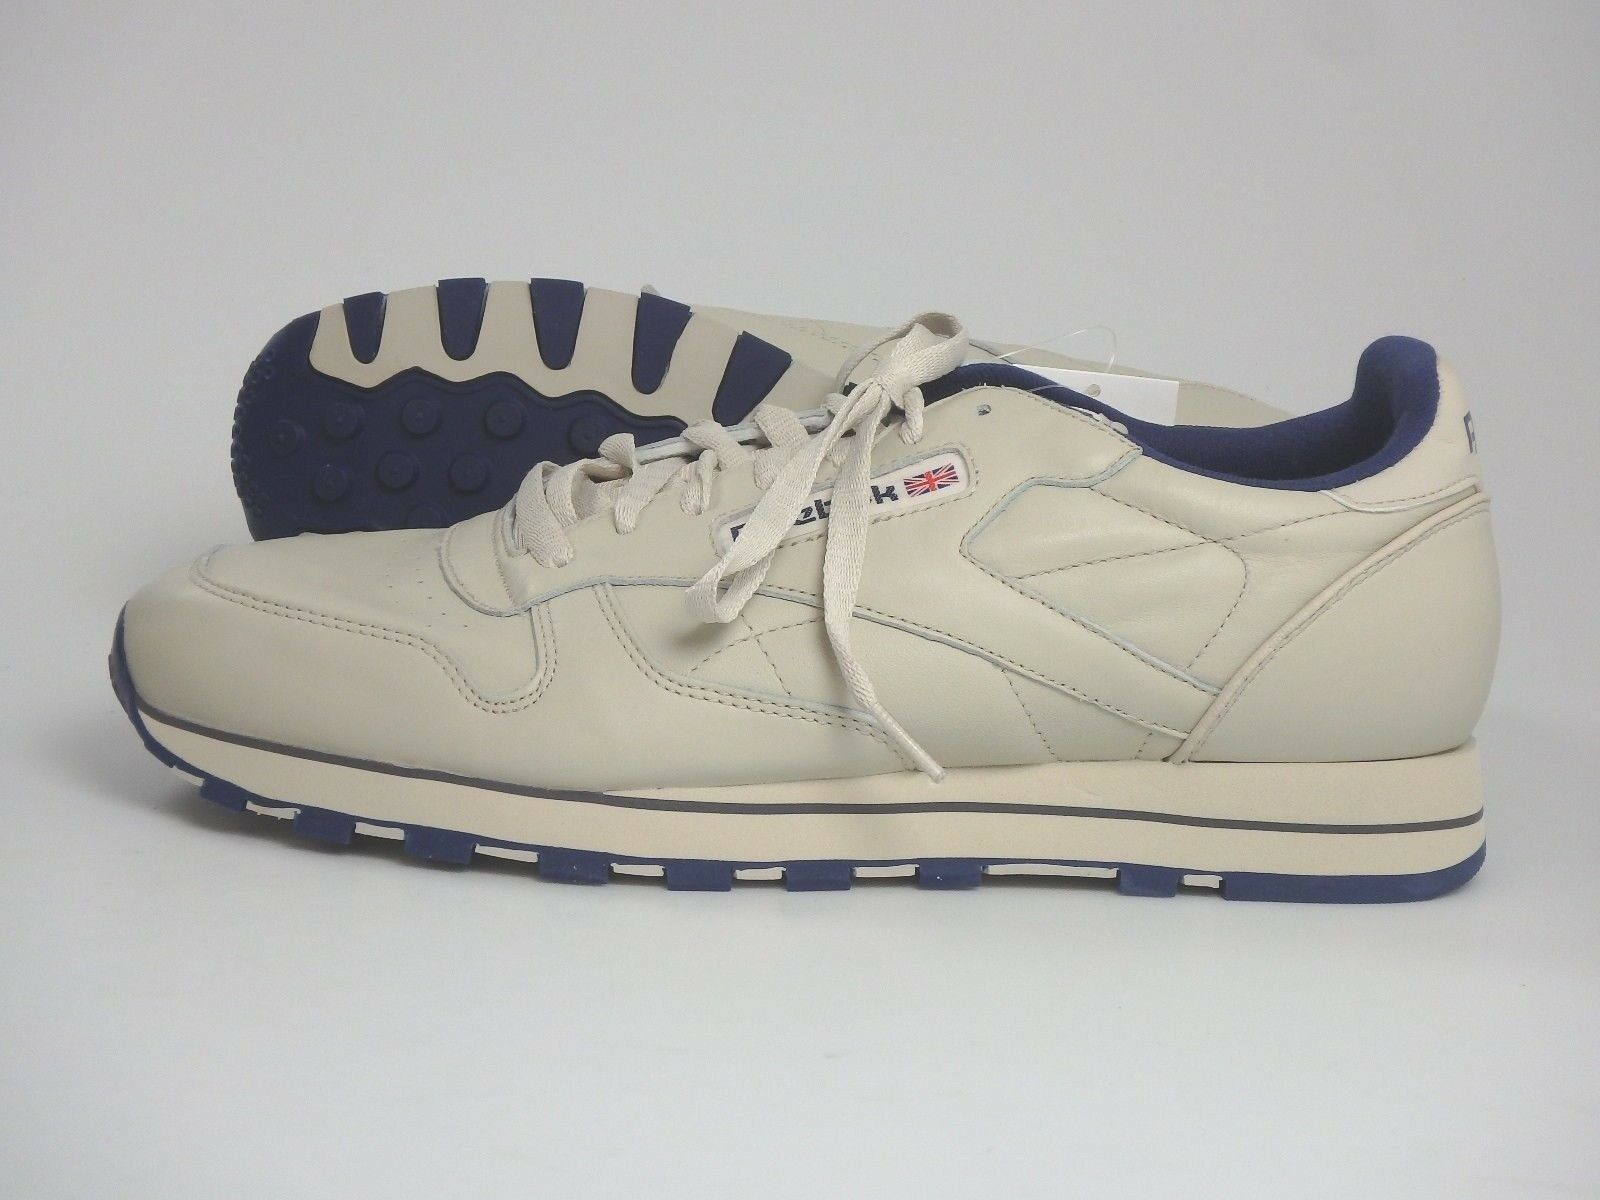 Reebok #25027 Claasic Leather Sneaker Freizeit Schuhe Herren Gr. 45,5 Beige